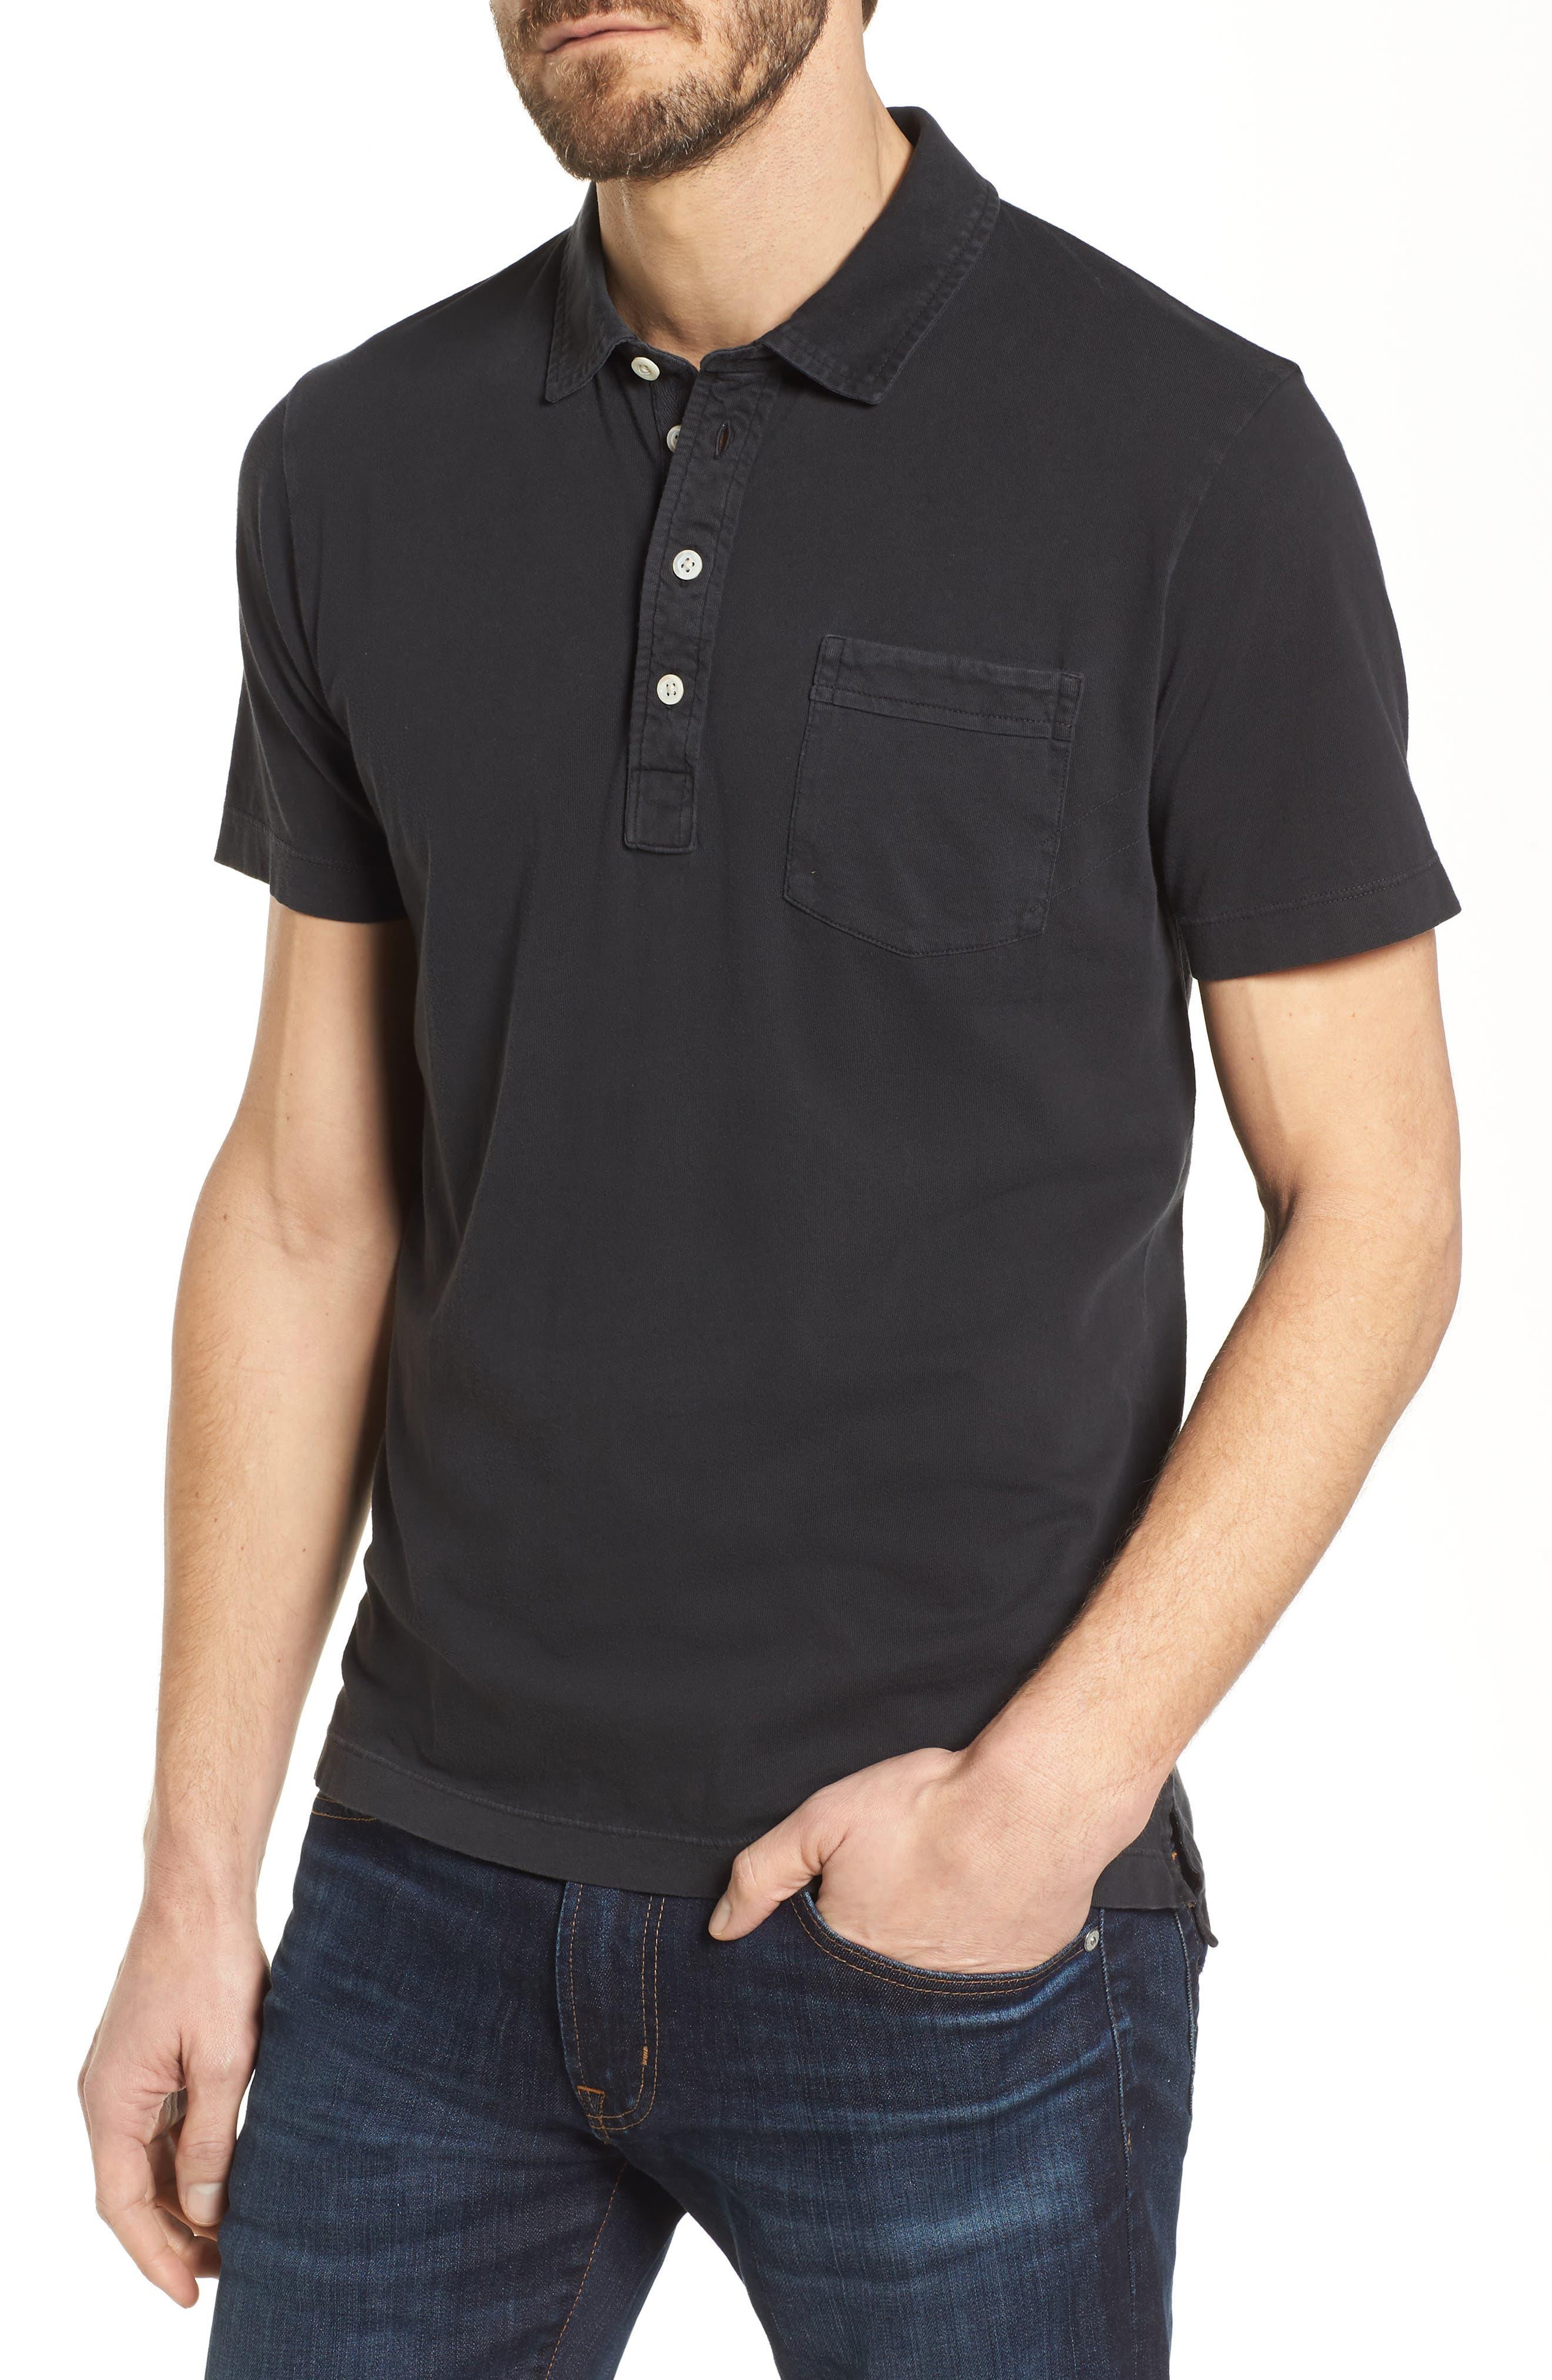 BILLY REID Pensacola Slim Fit Garment Dye Polo, Main, color, BLACK